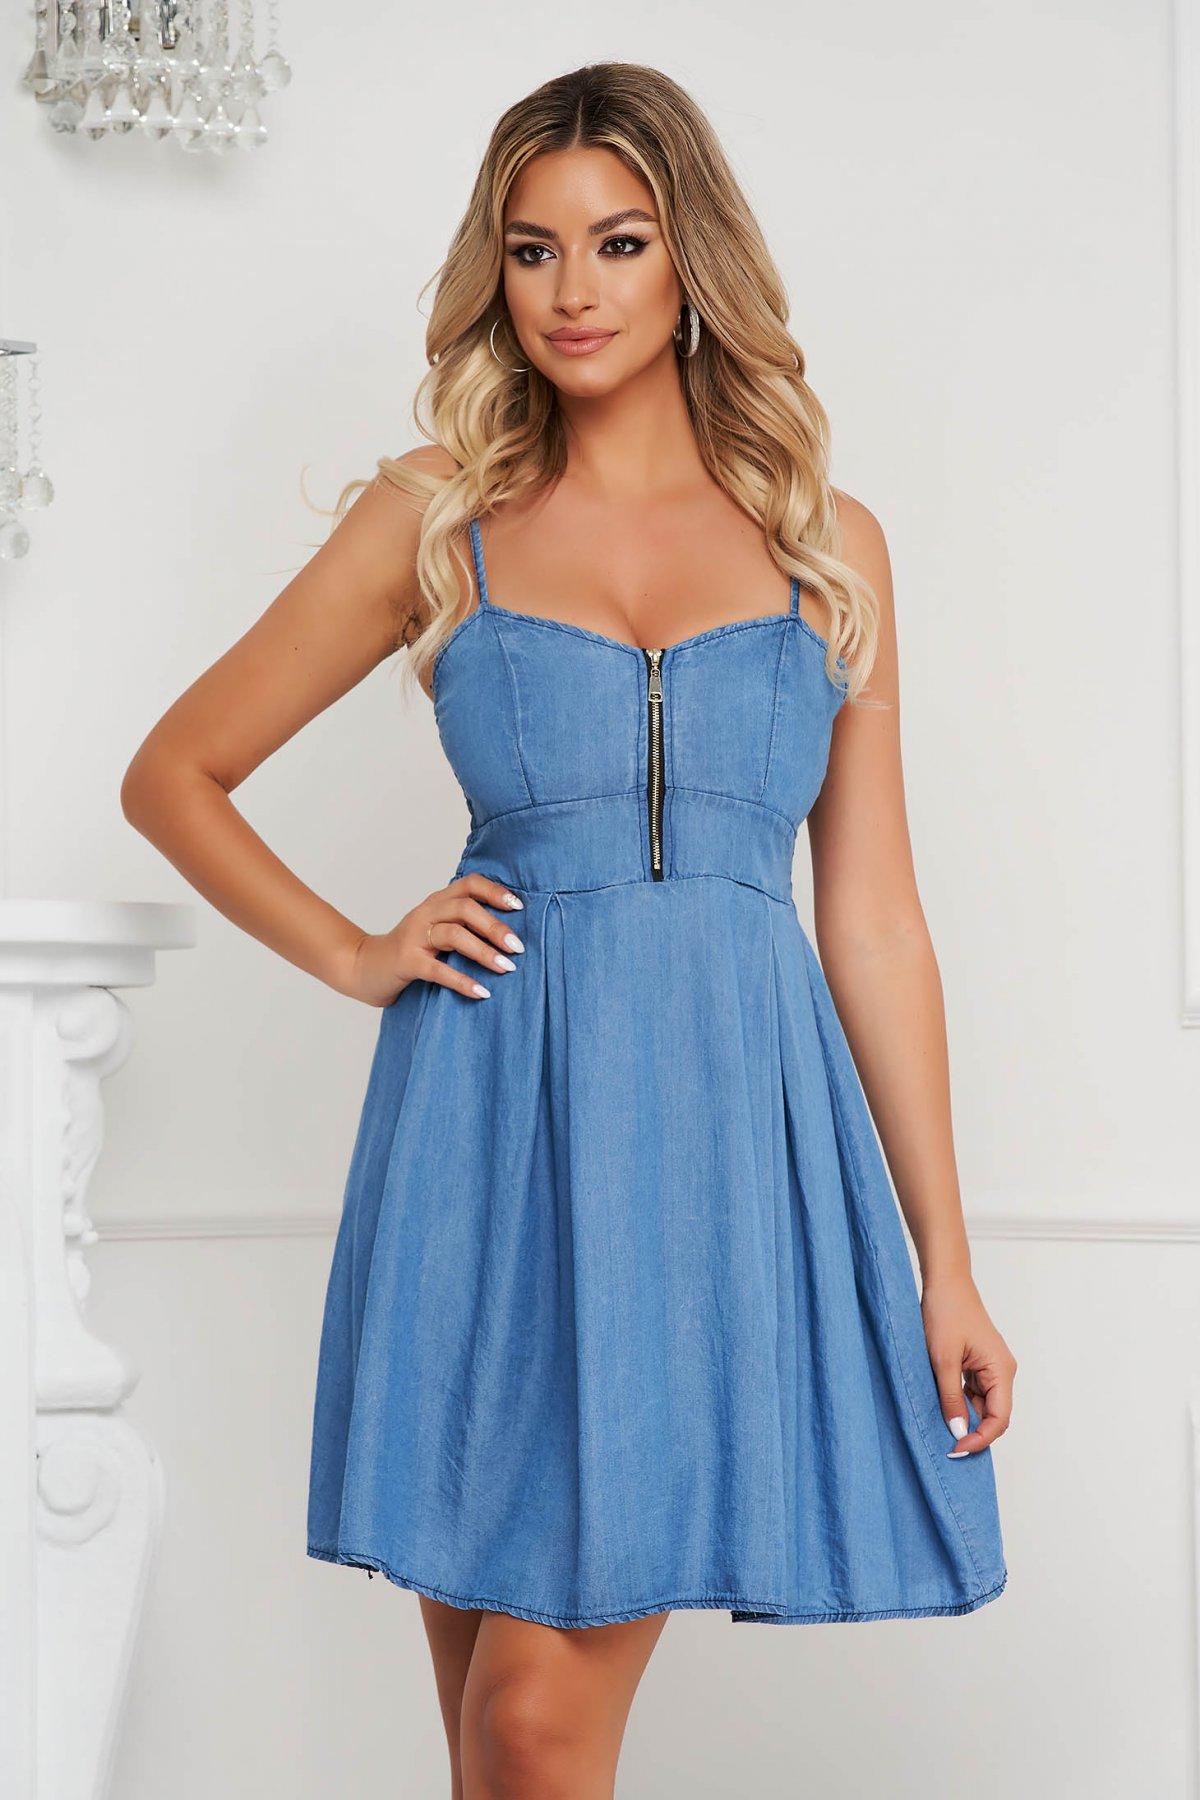 Rochie SunShine albastra scurta in clos din material subtire de blugi cu bretele